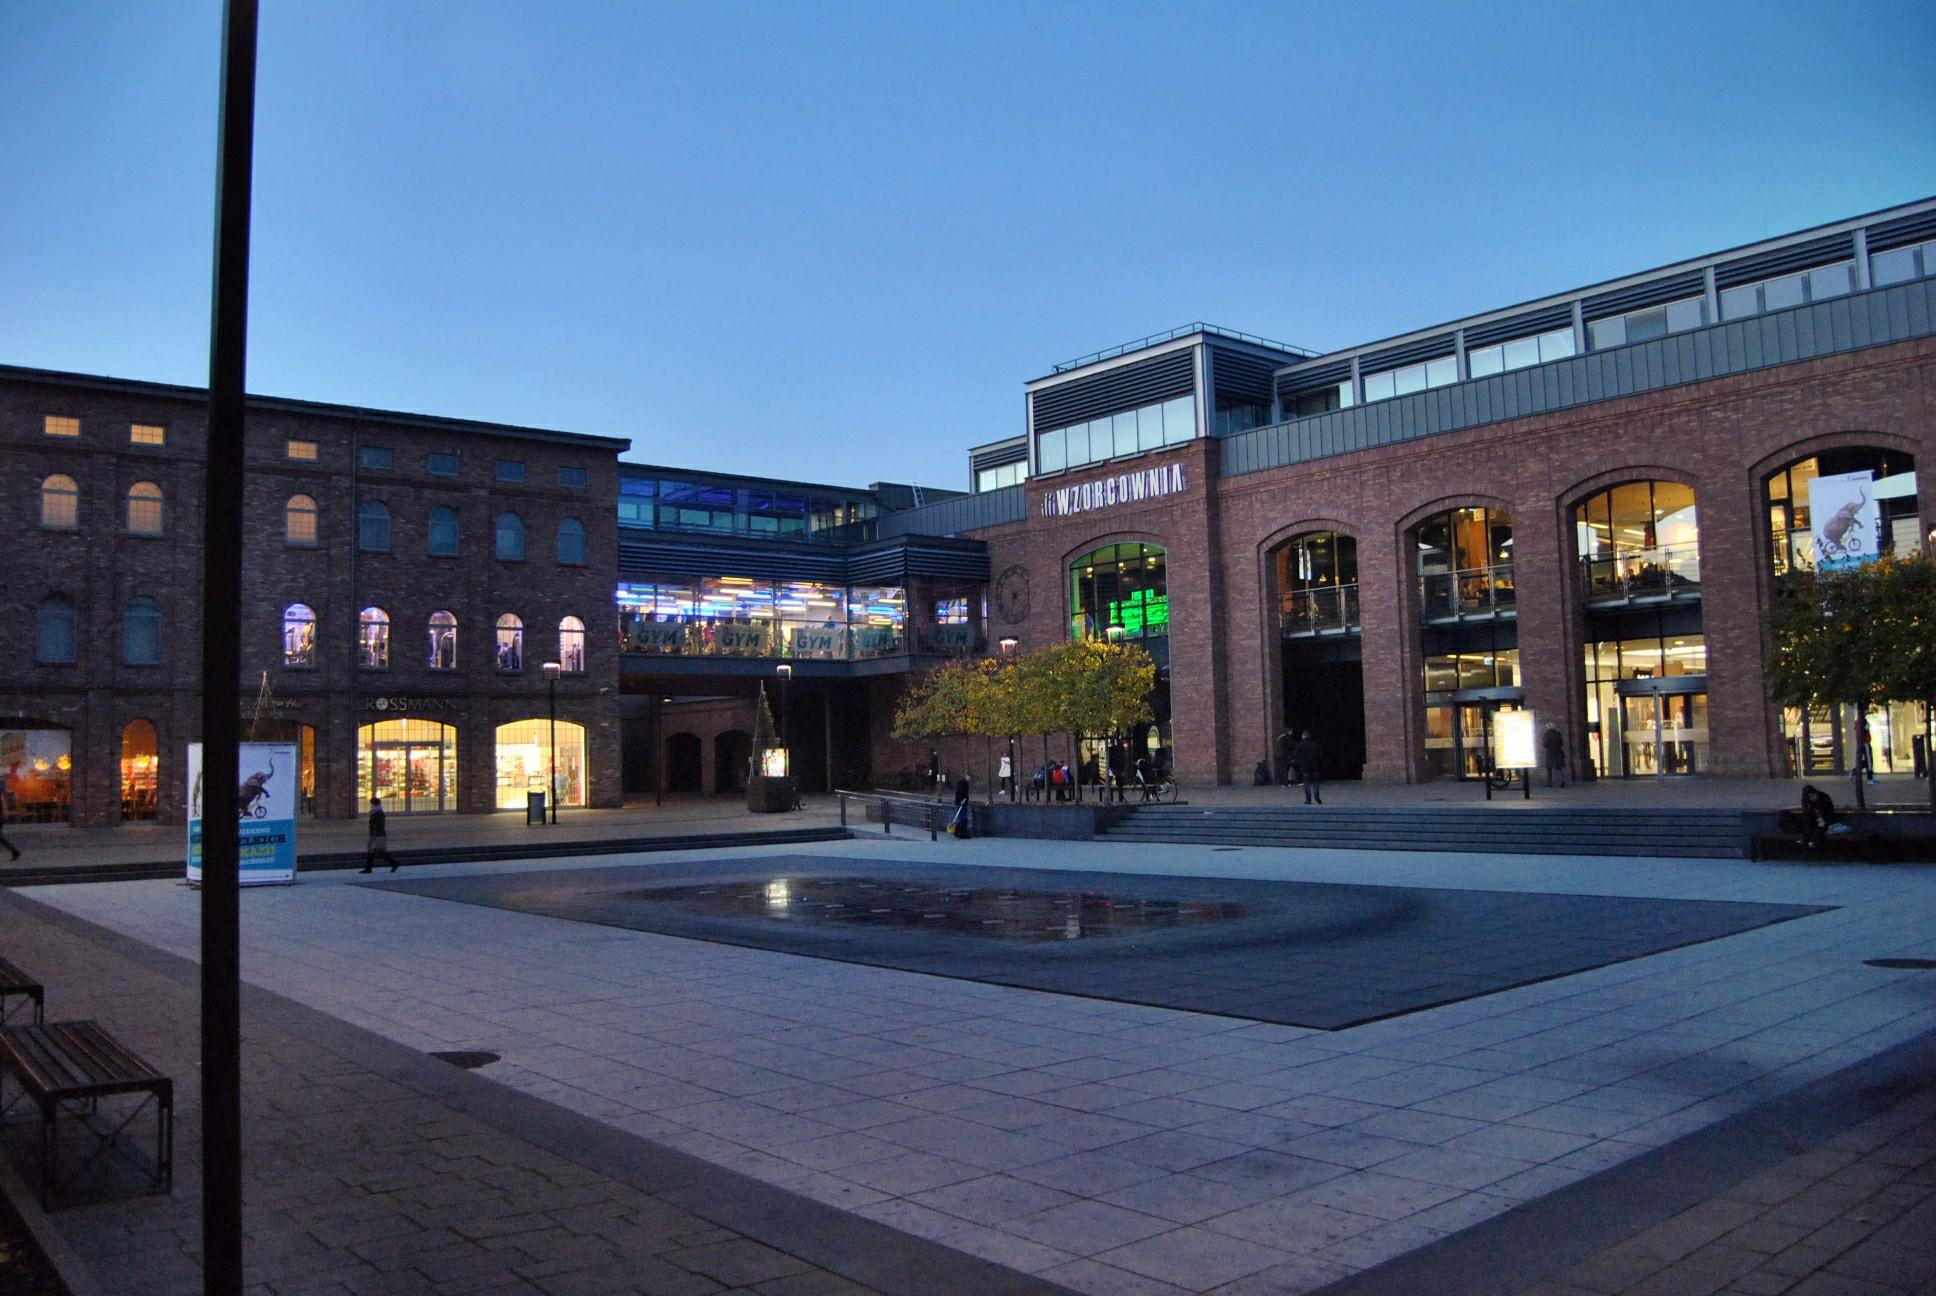 Einkaufszentrum-Wloclawek